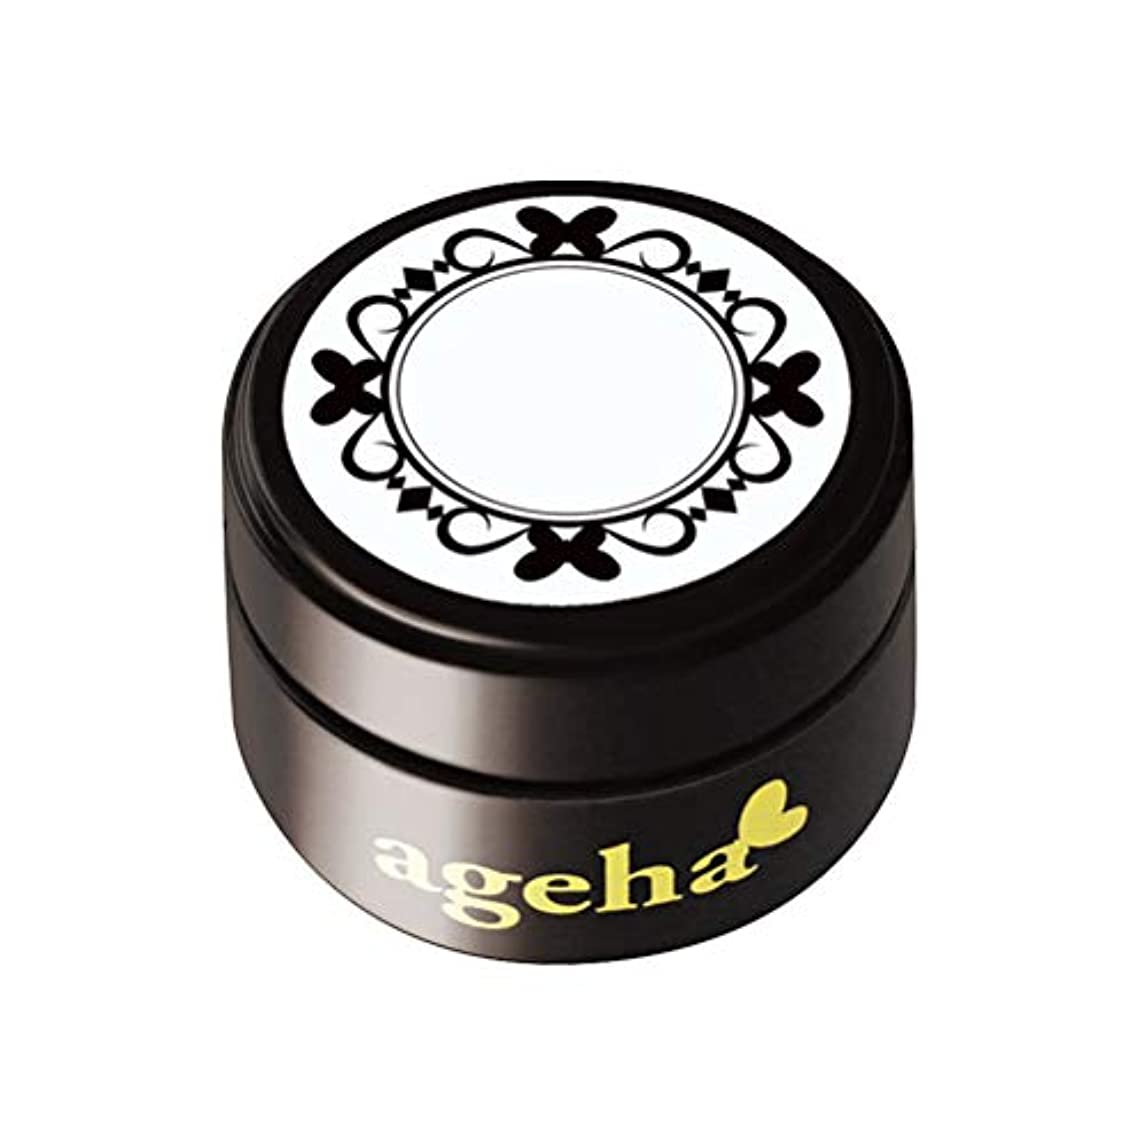 ageha カラージェル コスメカラー 132 ヒース G?MIX シアー?グリッター 2.7g UV/LED対応